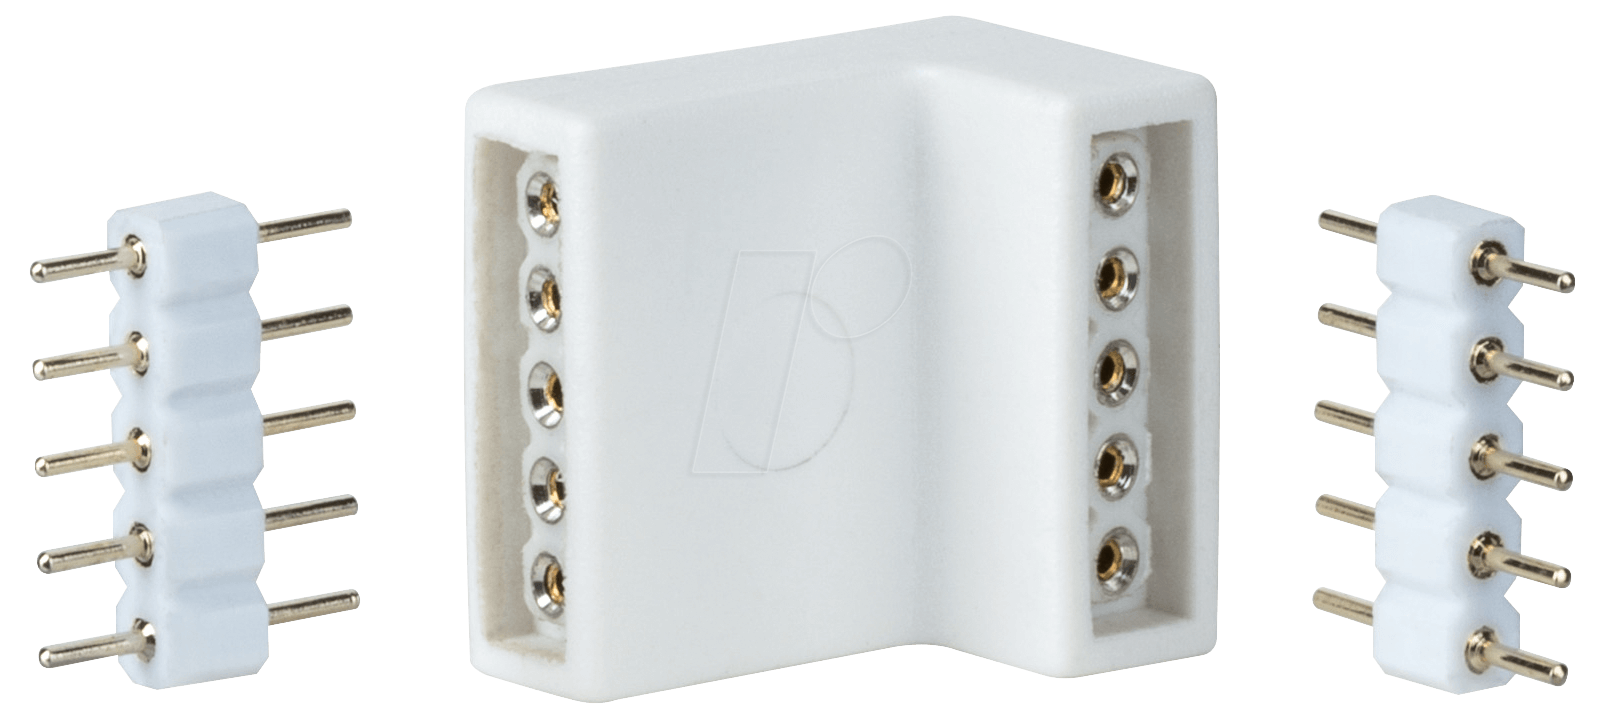 PLM 70615 - Eckverbinder für LED-Streifen MaxLED, 4er-Pack